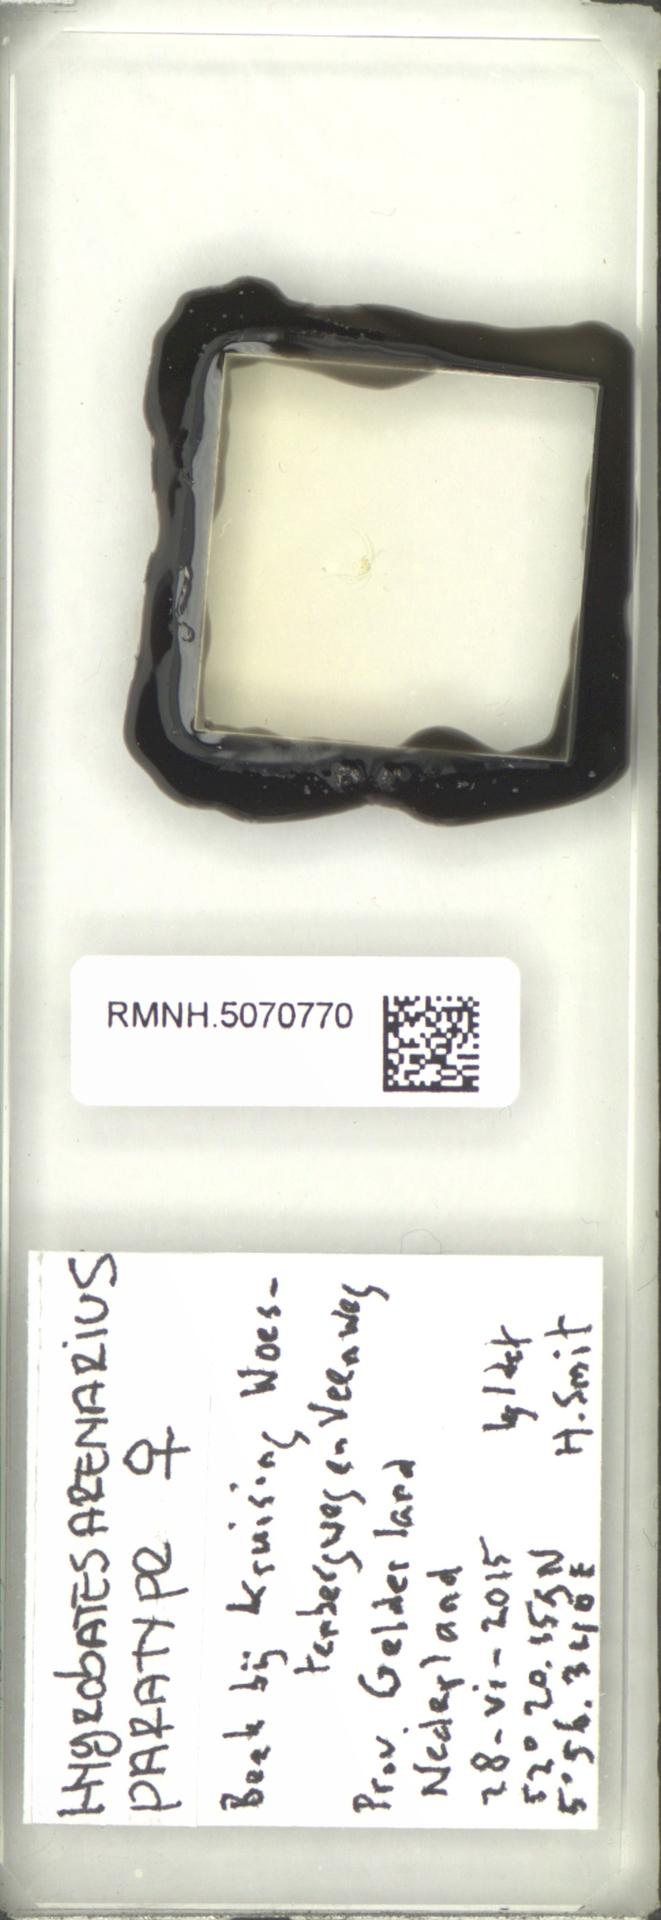 RMNH.5070770 | Hygrobates (Hygrobates) arenarius Smit & Pešić, 2017